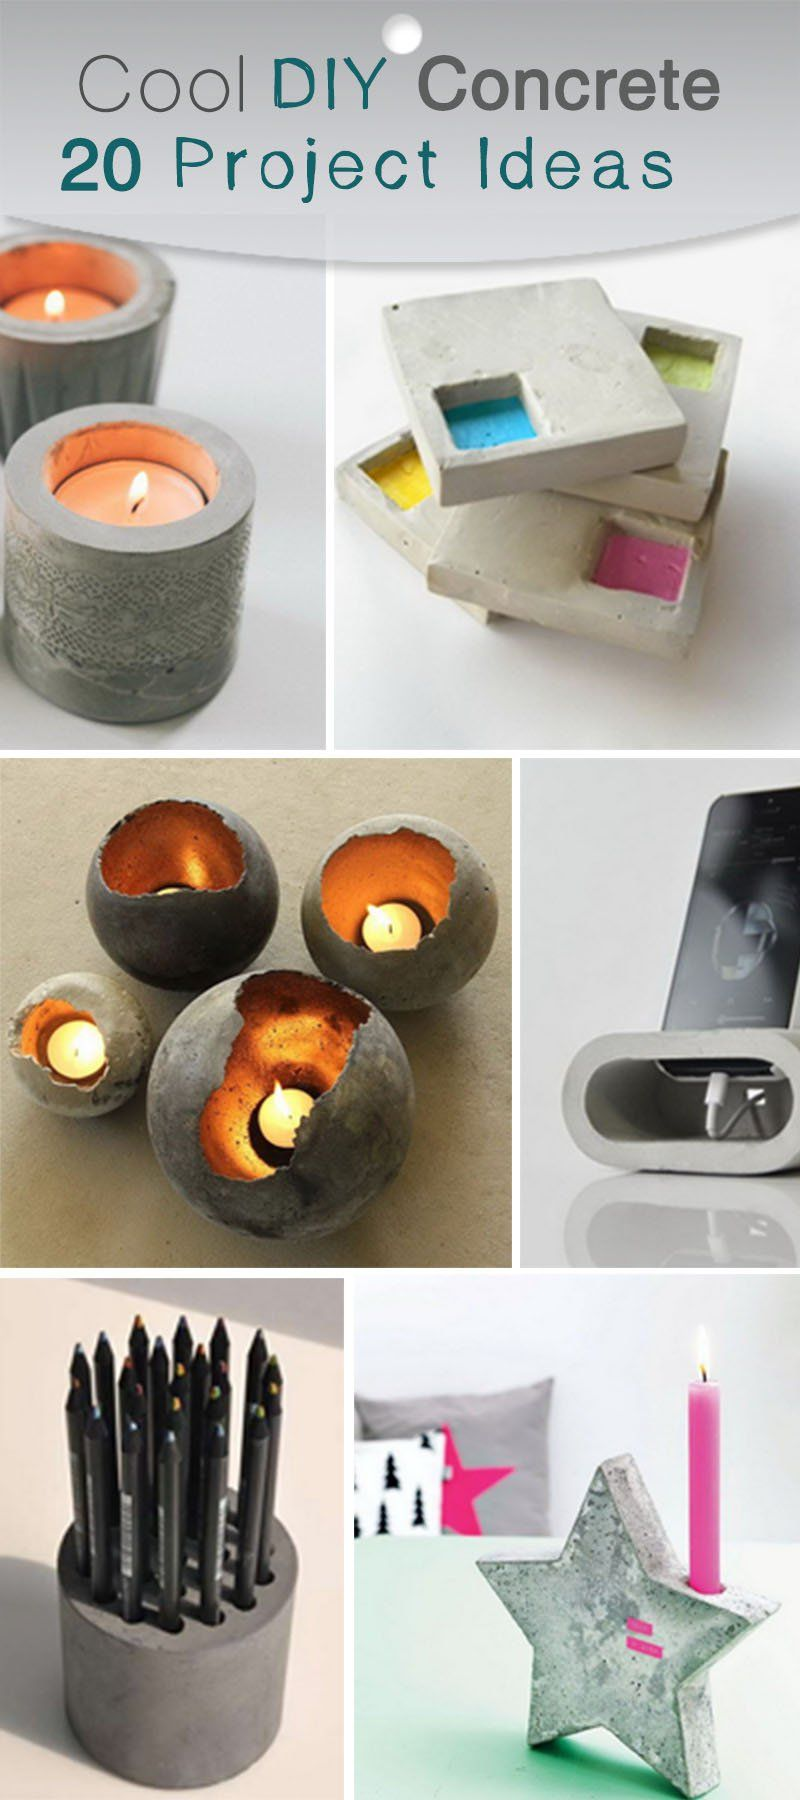 Beton Diy Schön Cool Diy Concrete Project Ideas муррр